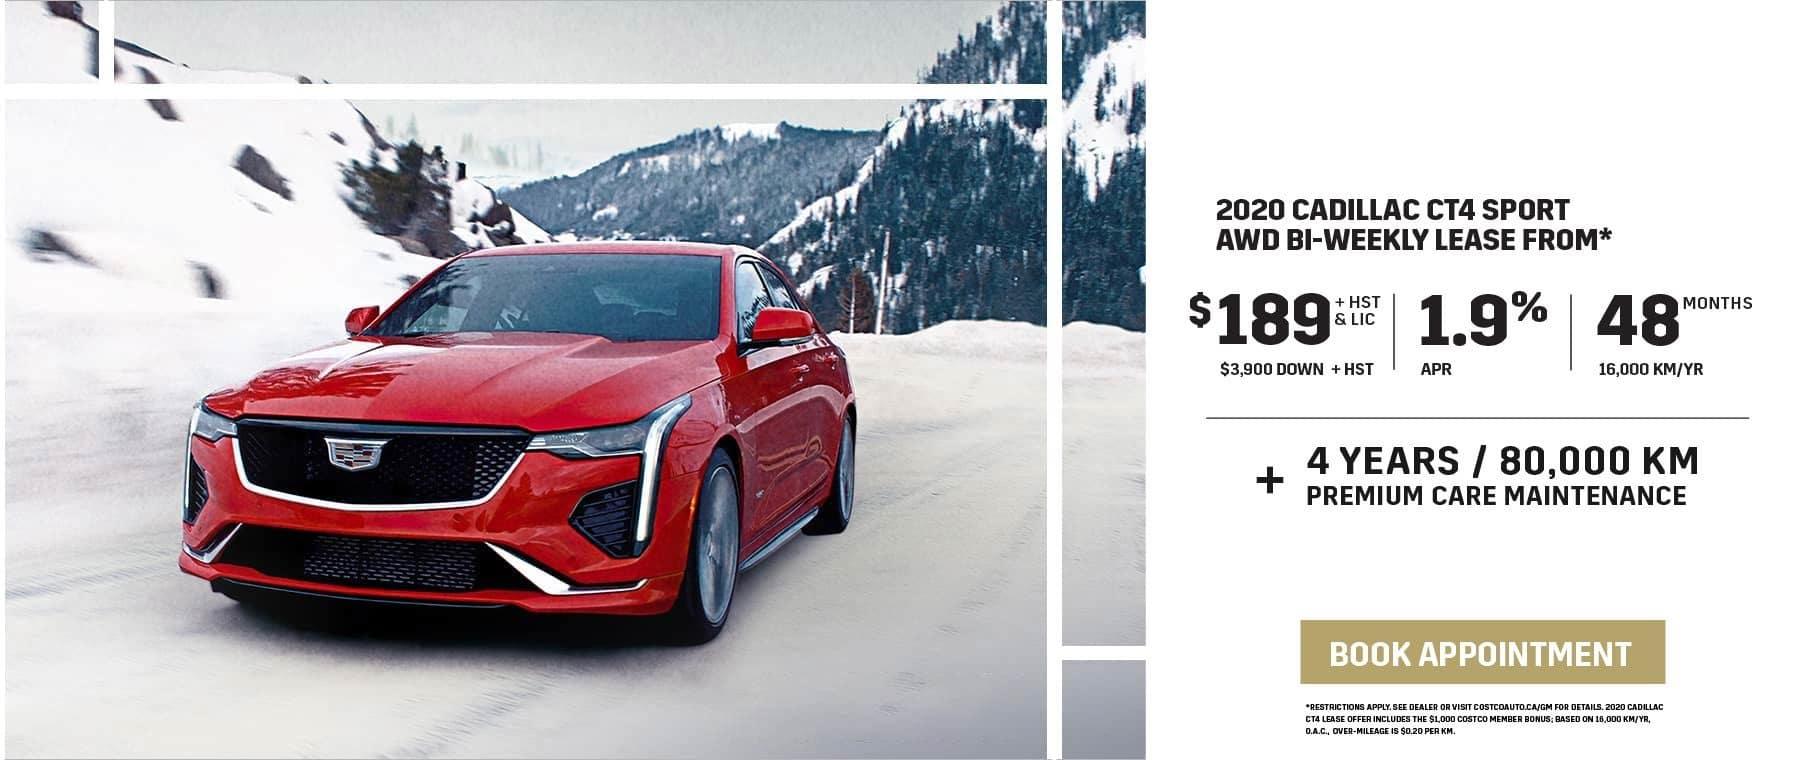 2020 CADILLAC CT4 SPORT AWD BI-WEEKLY LEASE FROM $189 Bi-Weekly